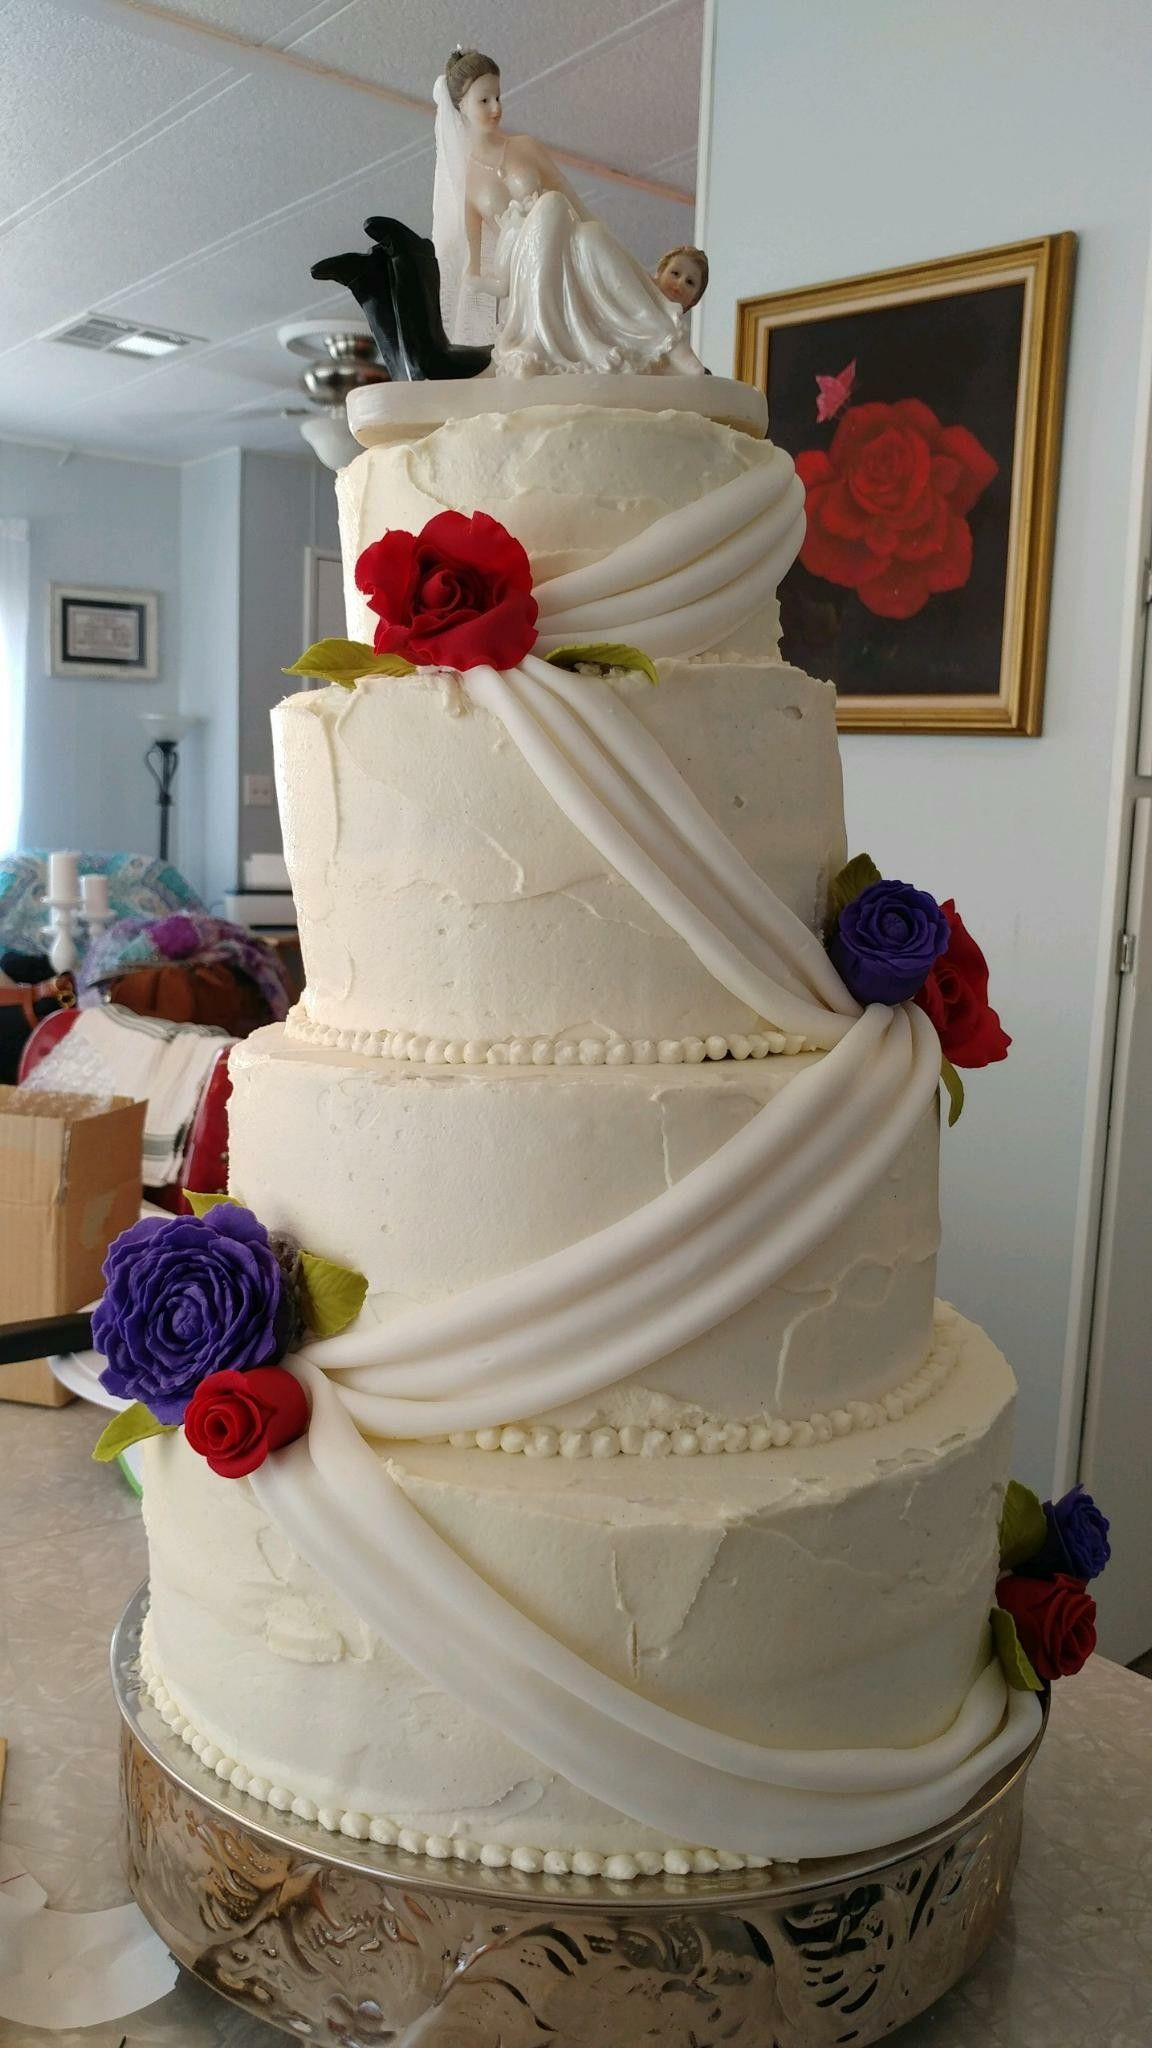 Red roses and purple peony wedding cake. Wedding cake